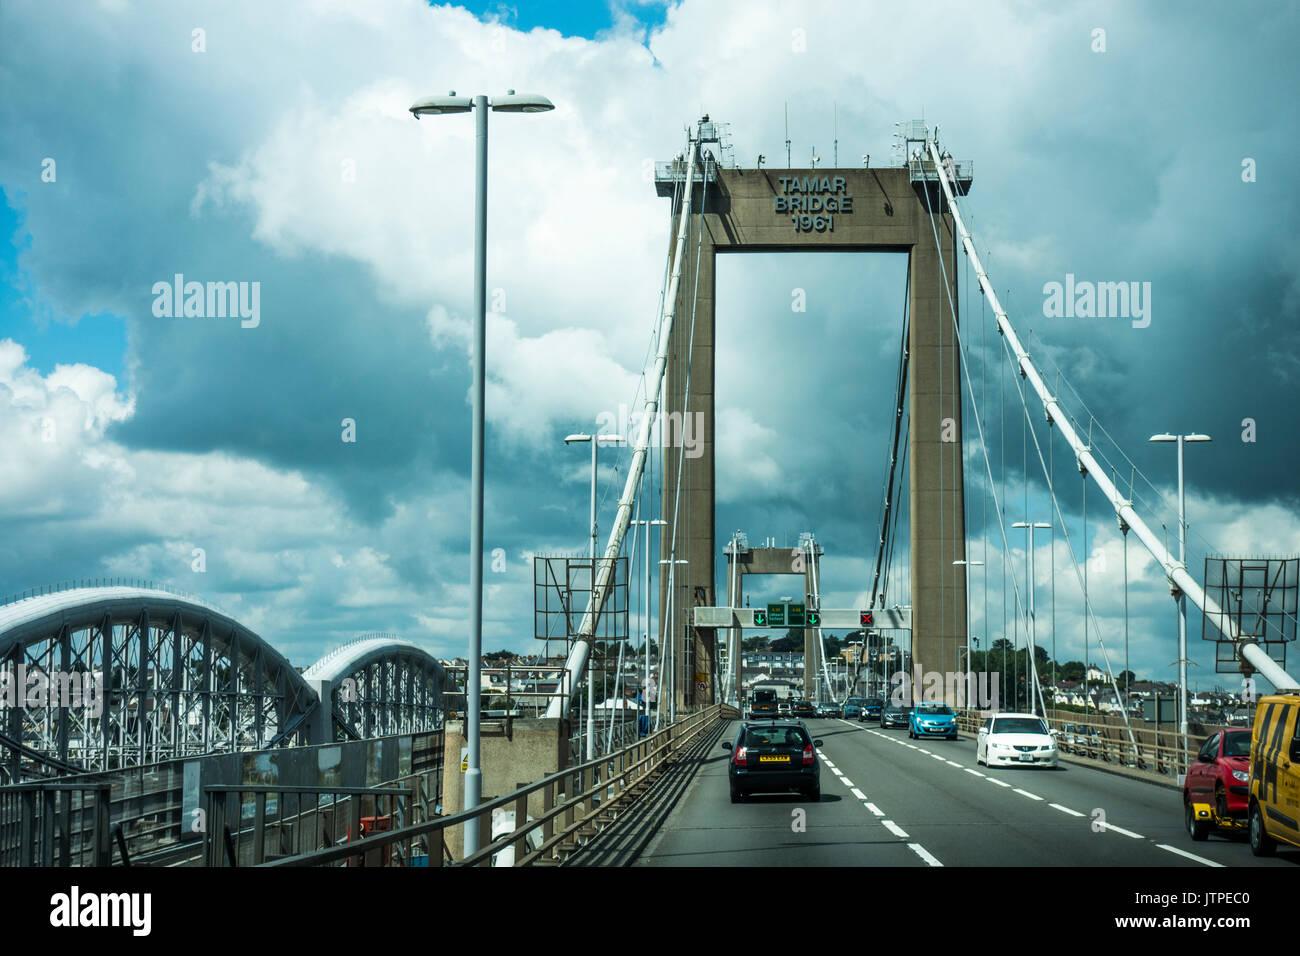 Traffic on the Tamar Bridge between Plymouth, Devon and Saltash, Cornwall, England, UK. - Stock Image